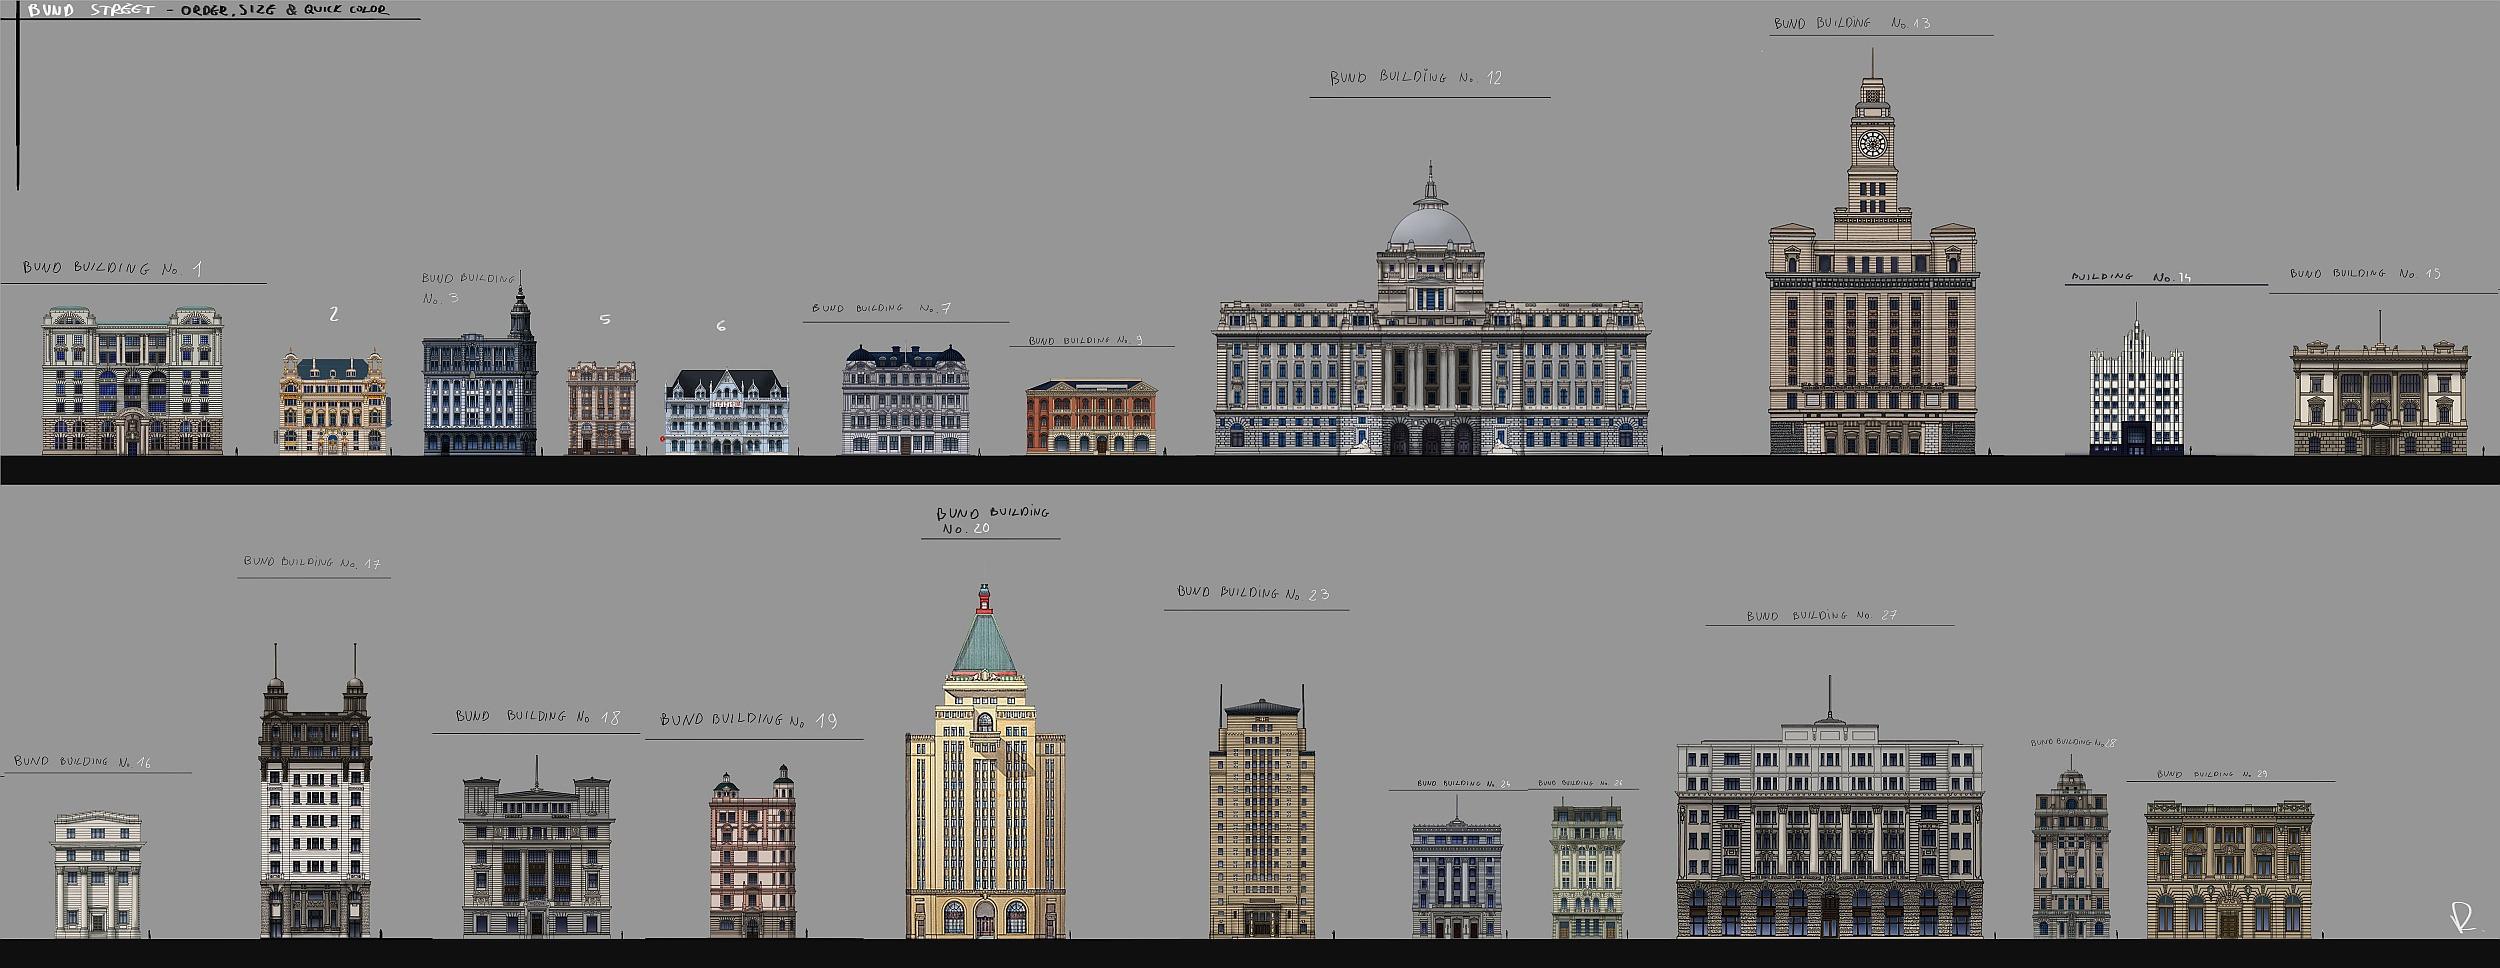 building order and facades